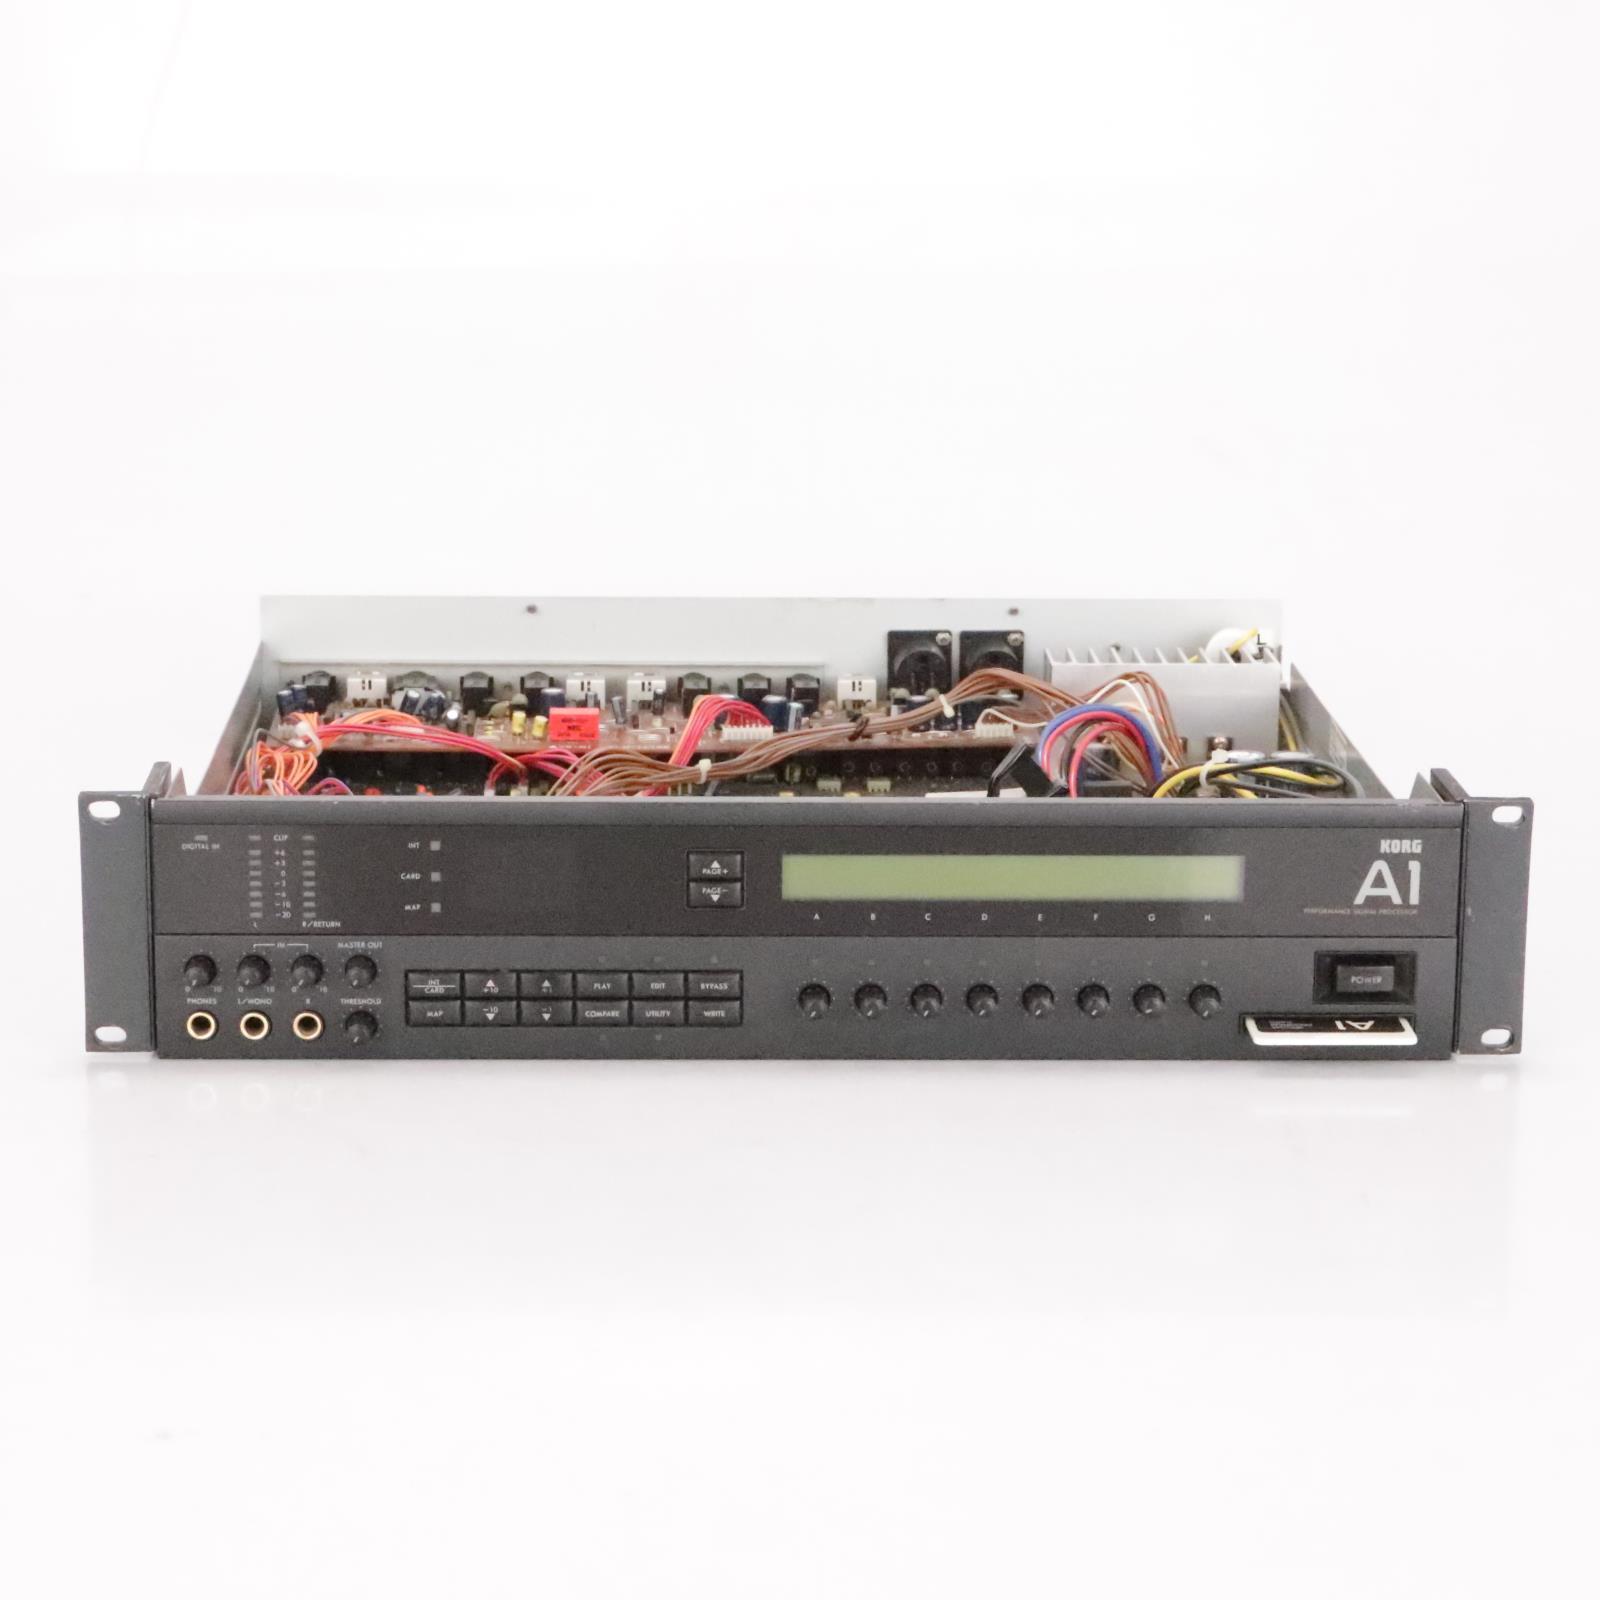 Korg A1 Performance Signal Processor Rackmount FX Effects Unit w/ Manuals #36742